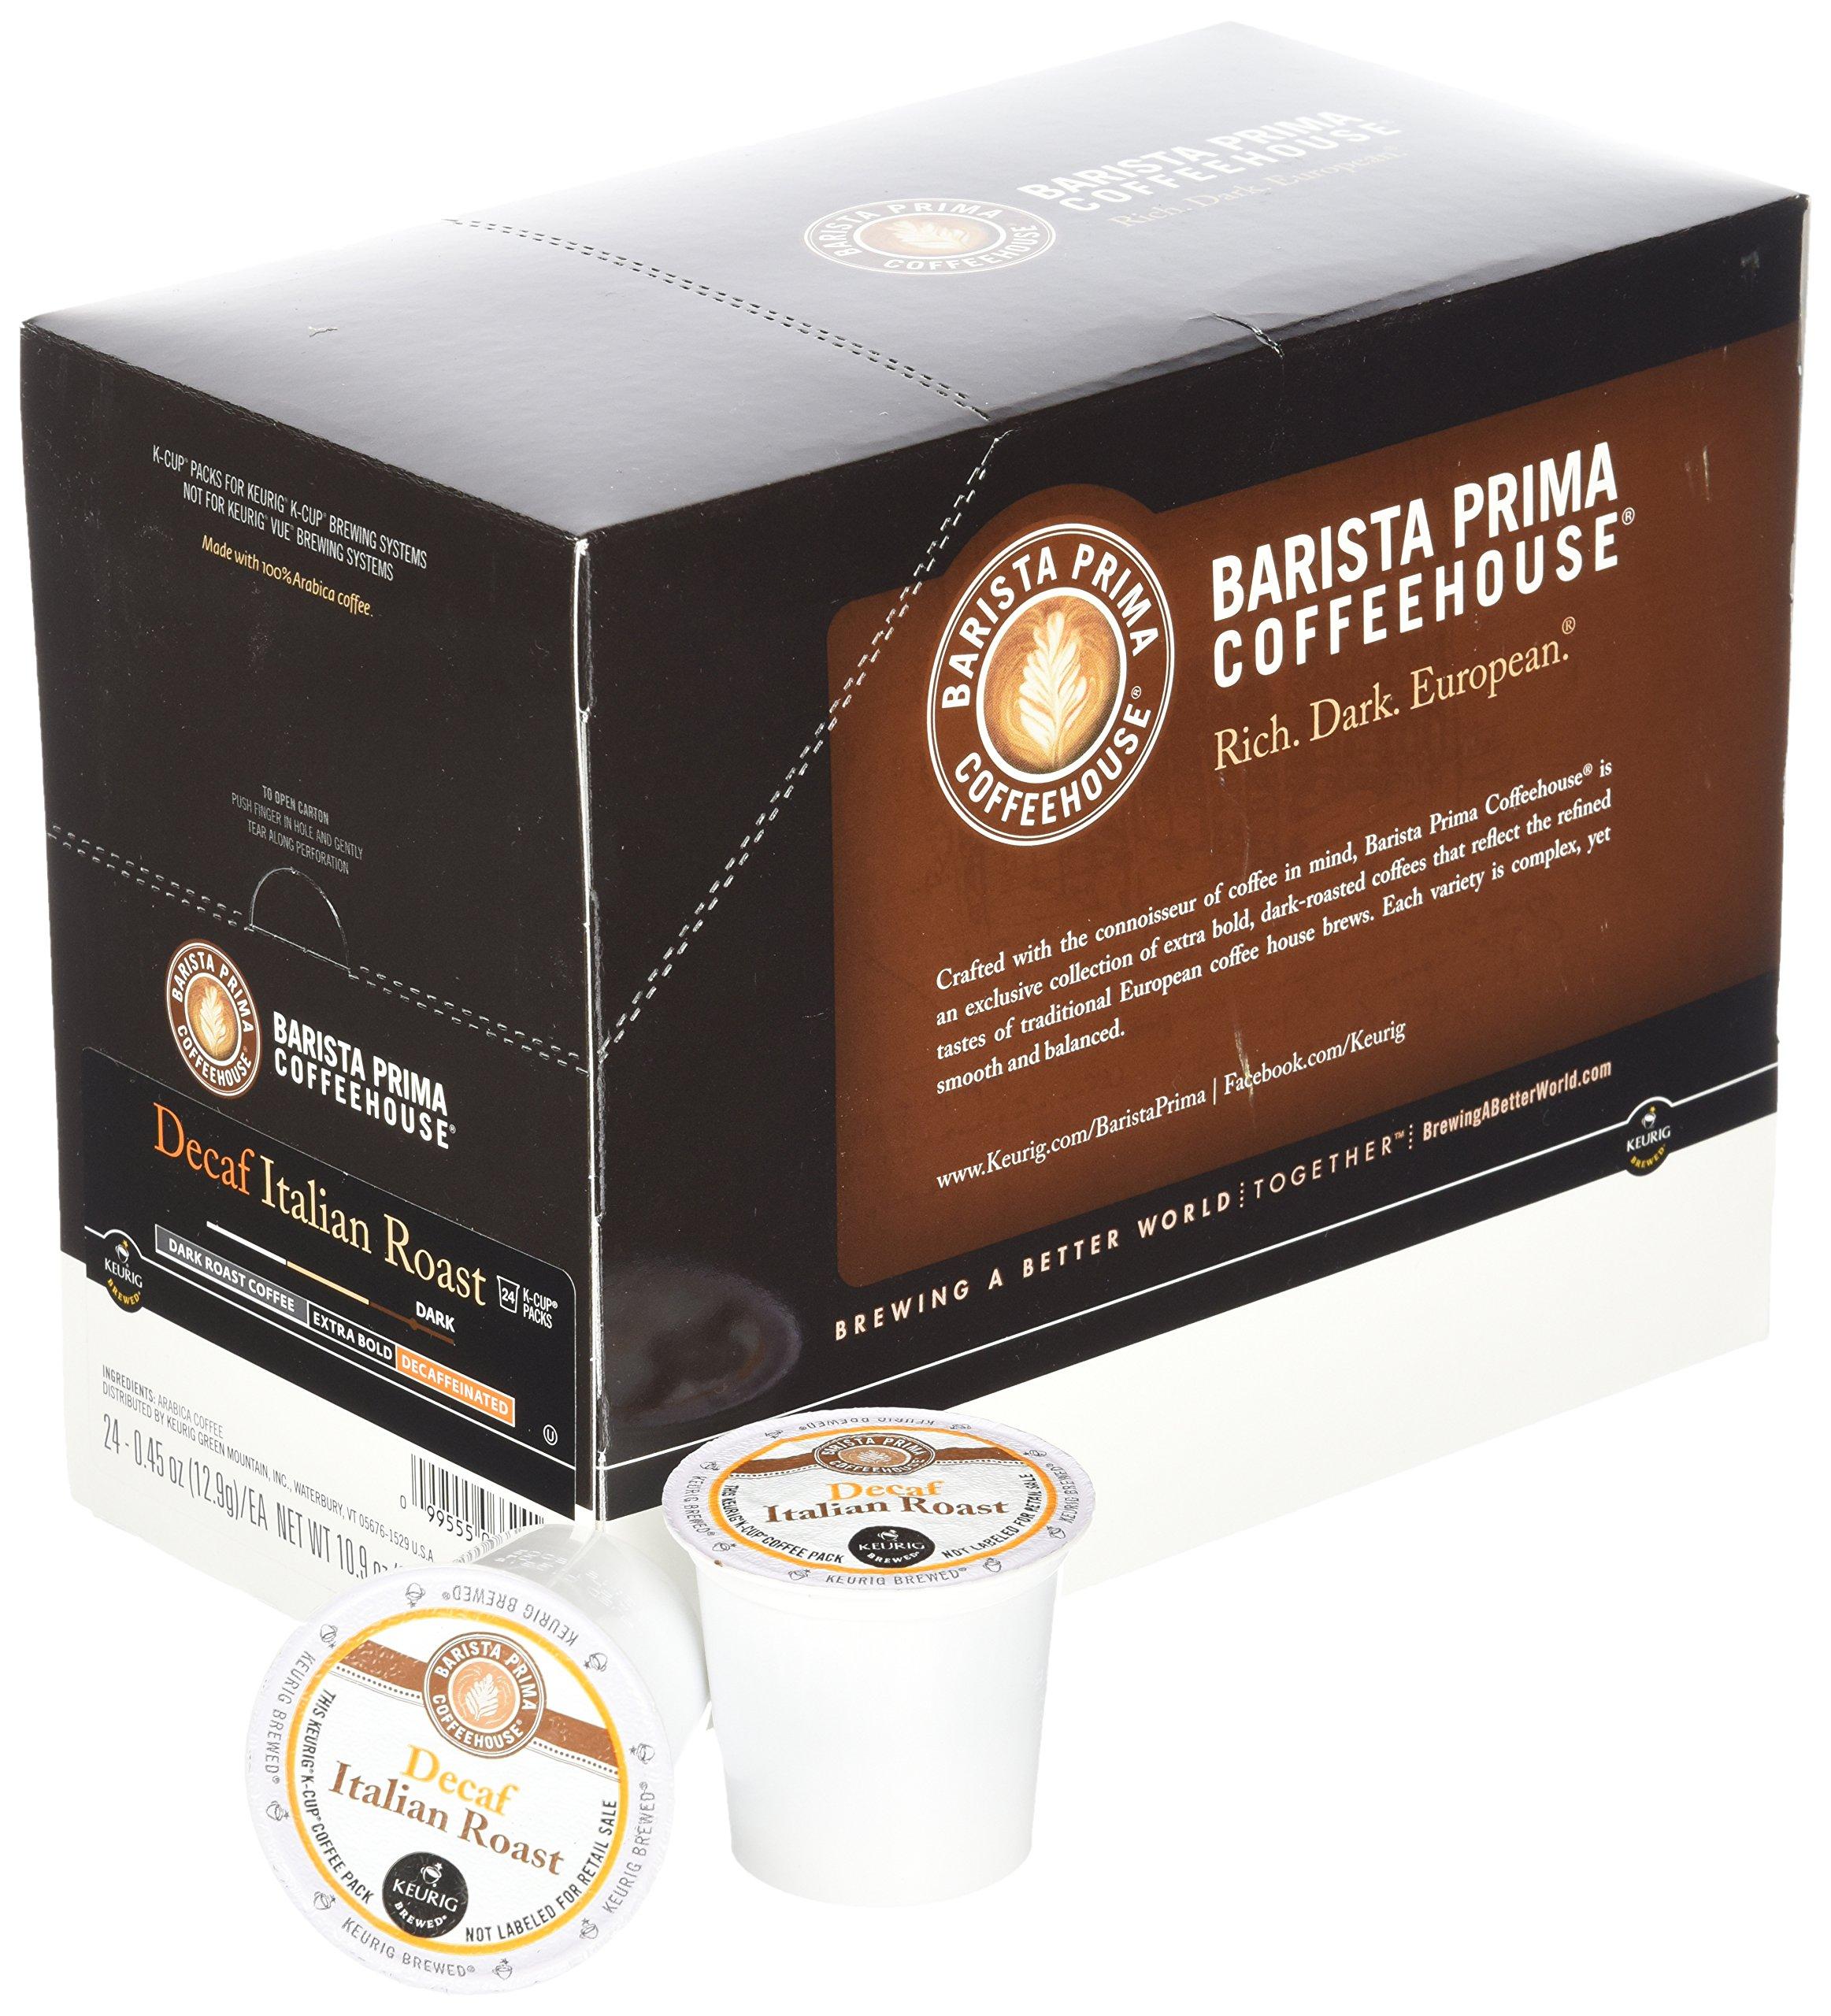 Barista Prima Decaf Coffee, Italian Roast, Rich. Dark. European., 24- Count K-Cup by Barista Prima (Image #3)